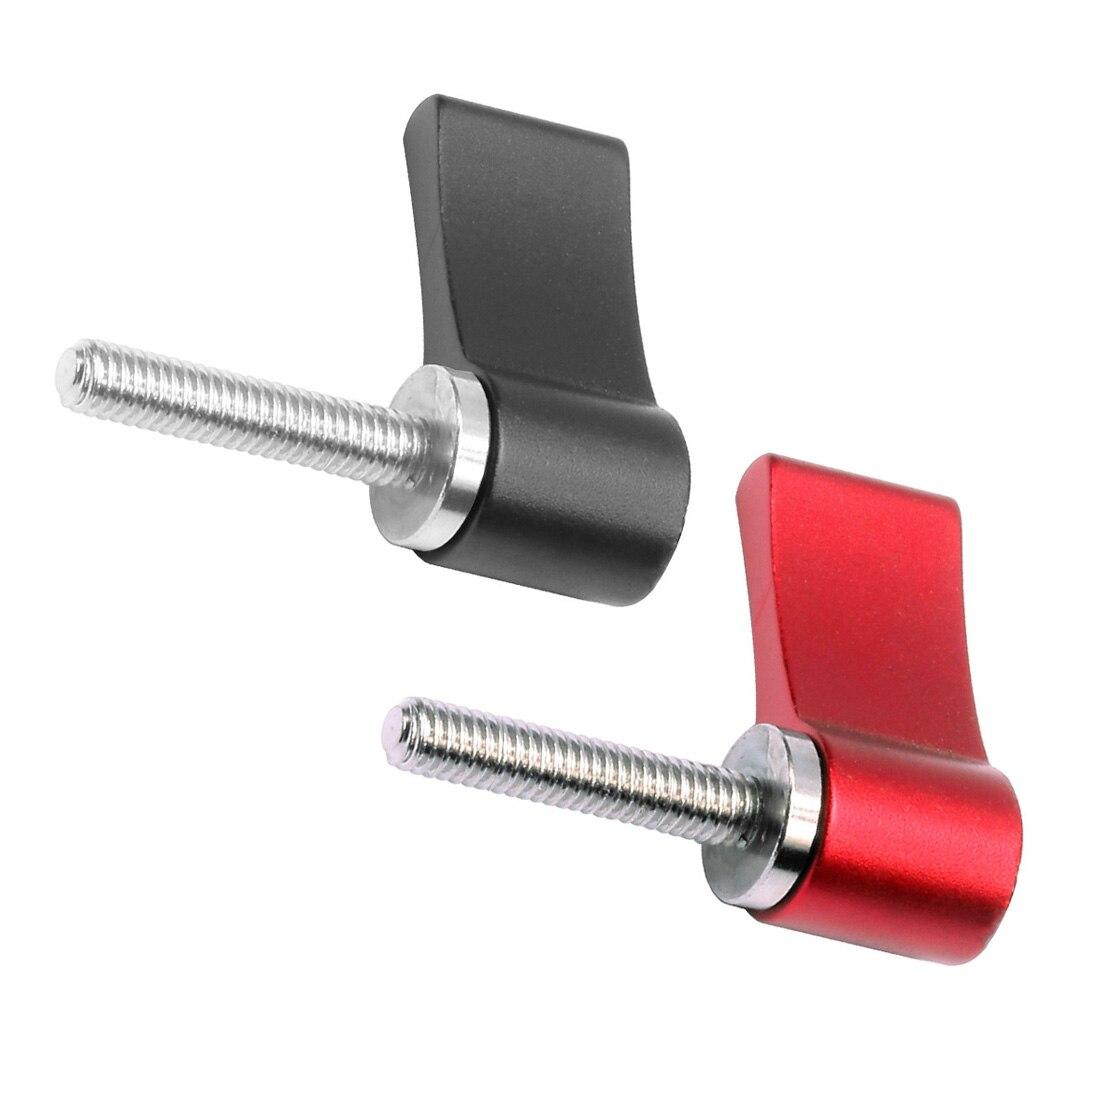 K0122.10527X25 Size 1 Kipp 06460-10527X25 Zinc Adjustable Handle with M5 External Thread Steel Components 25 mm Screw Length KIPP Inc Ruby Red Powder-Coated Finish Modern Design Style Metric